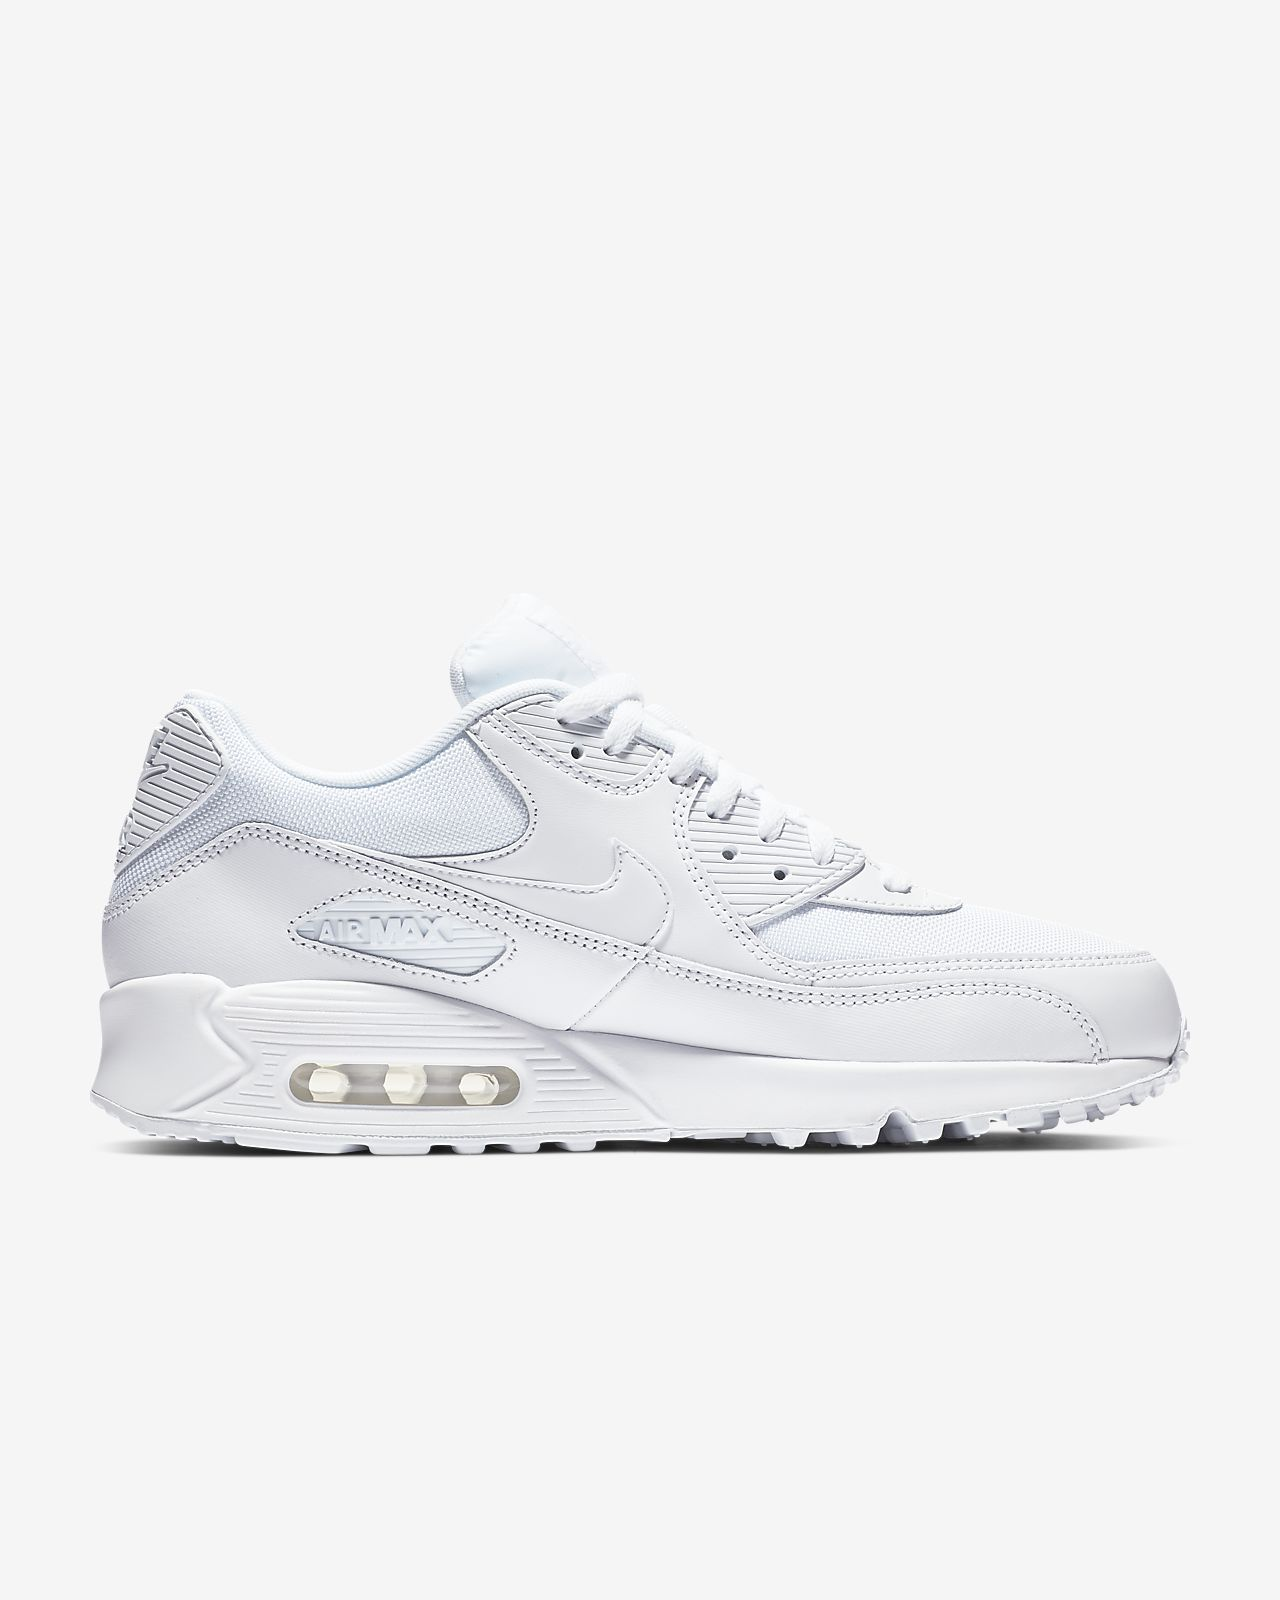 save off 5a29c 24f51 ... Skon Nike Air Max 90 Essential för män